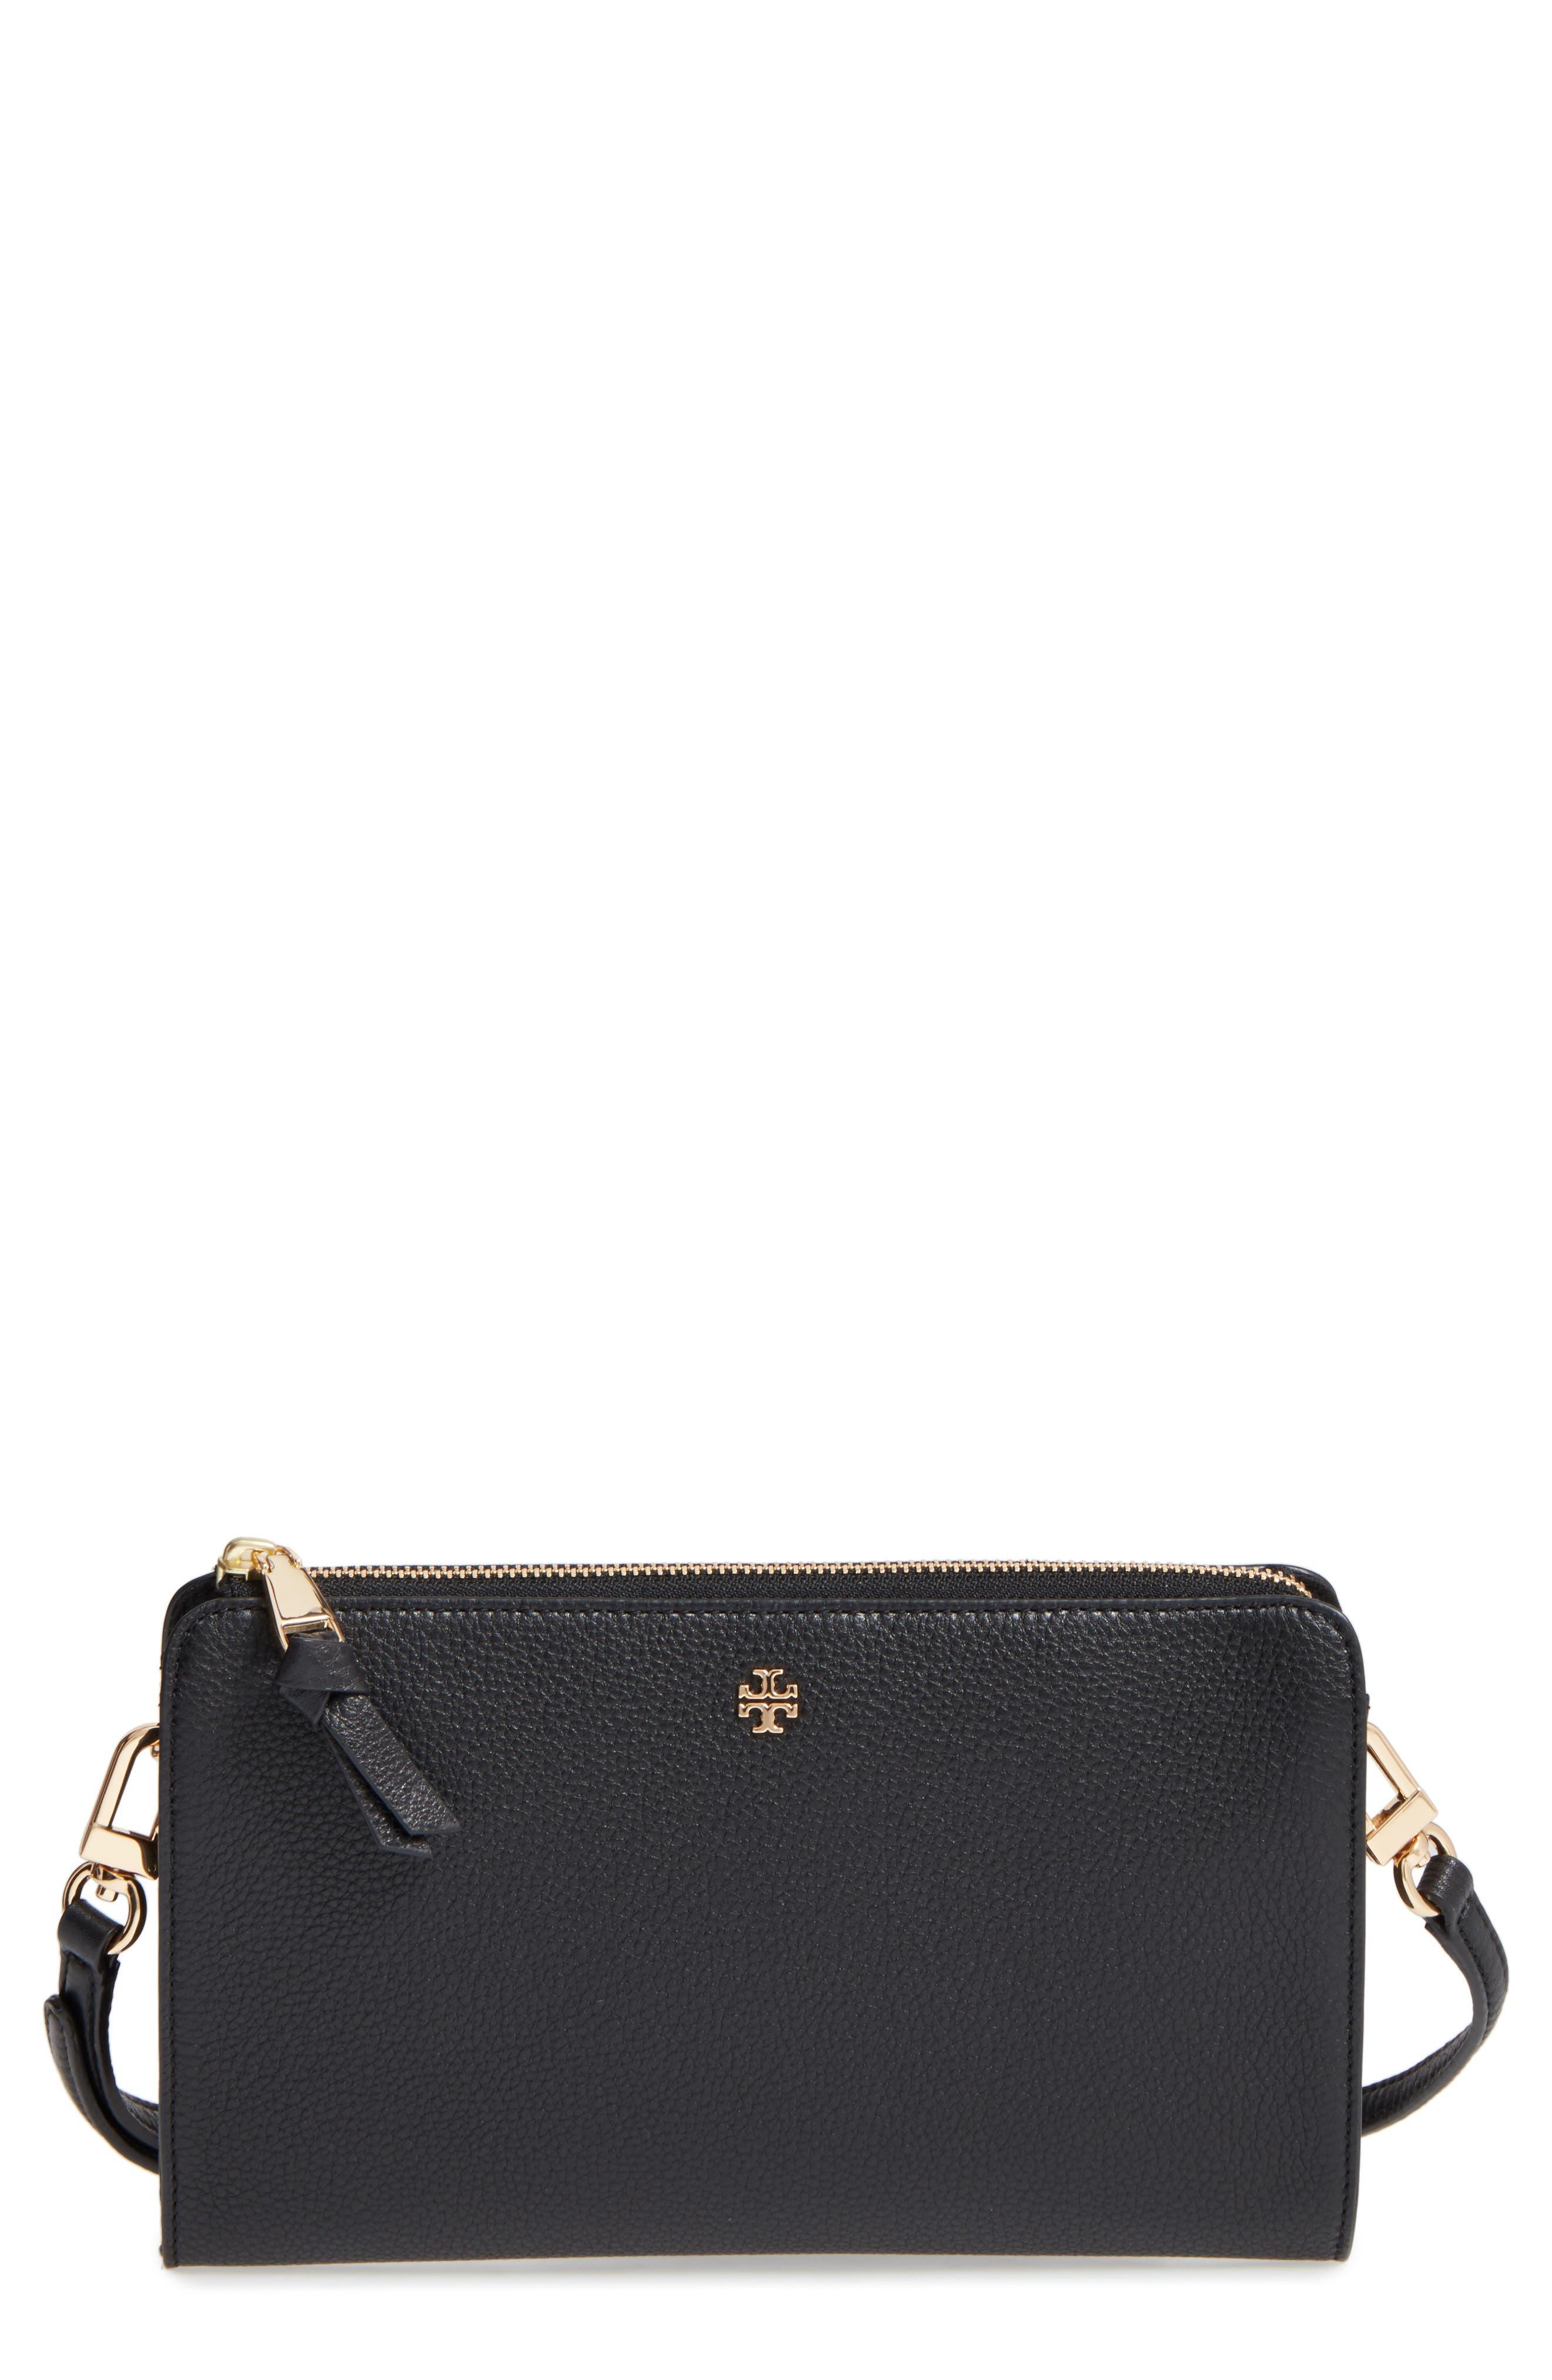 Robinson Leather Wallet/Crossbody Bag,                             Main thumbnail 1, color,                             001